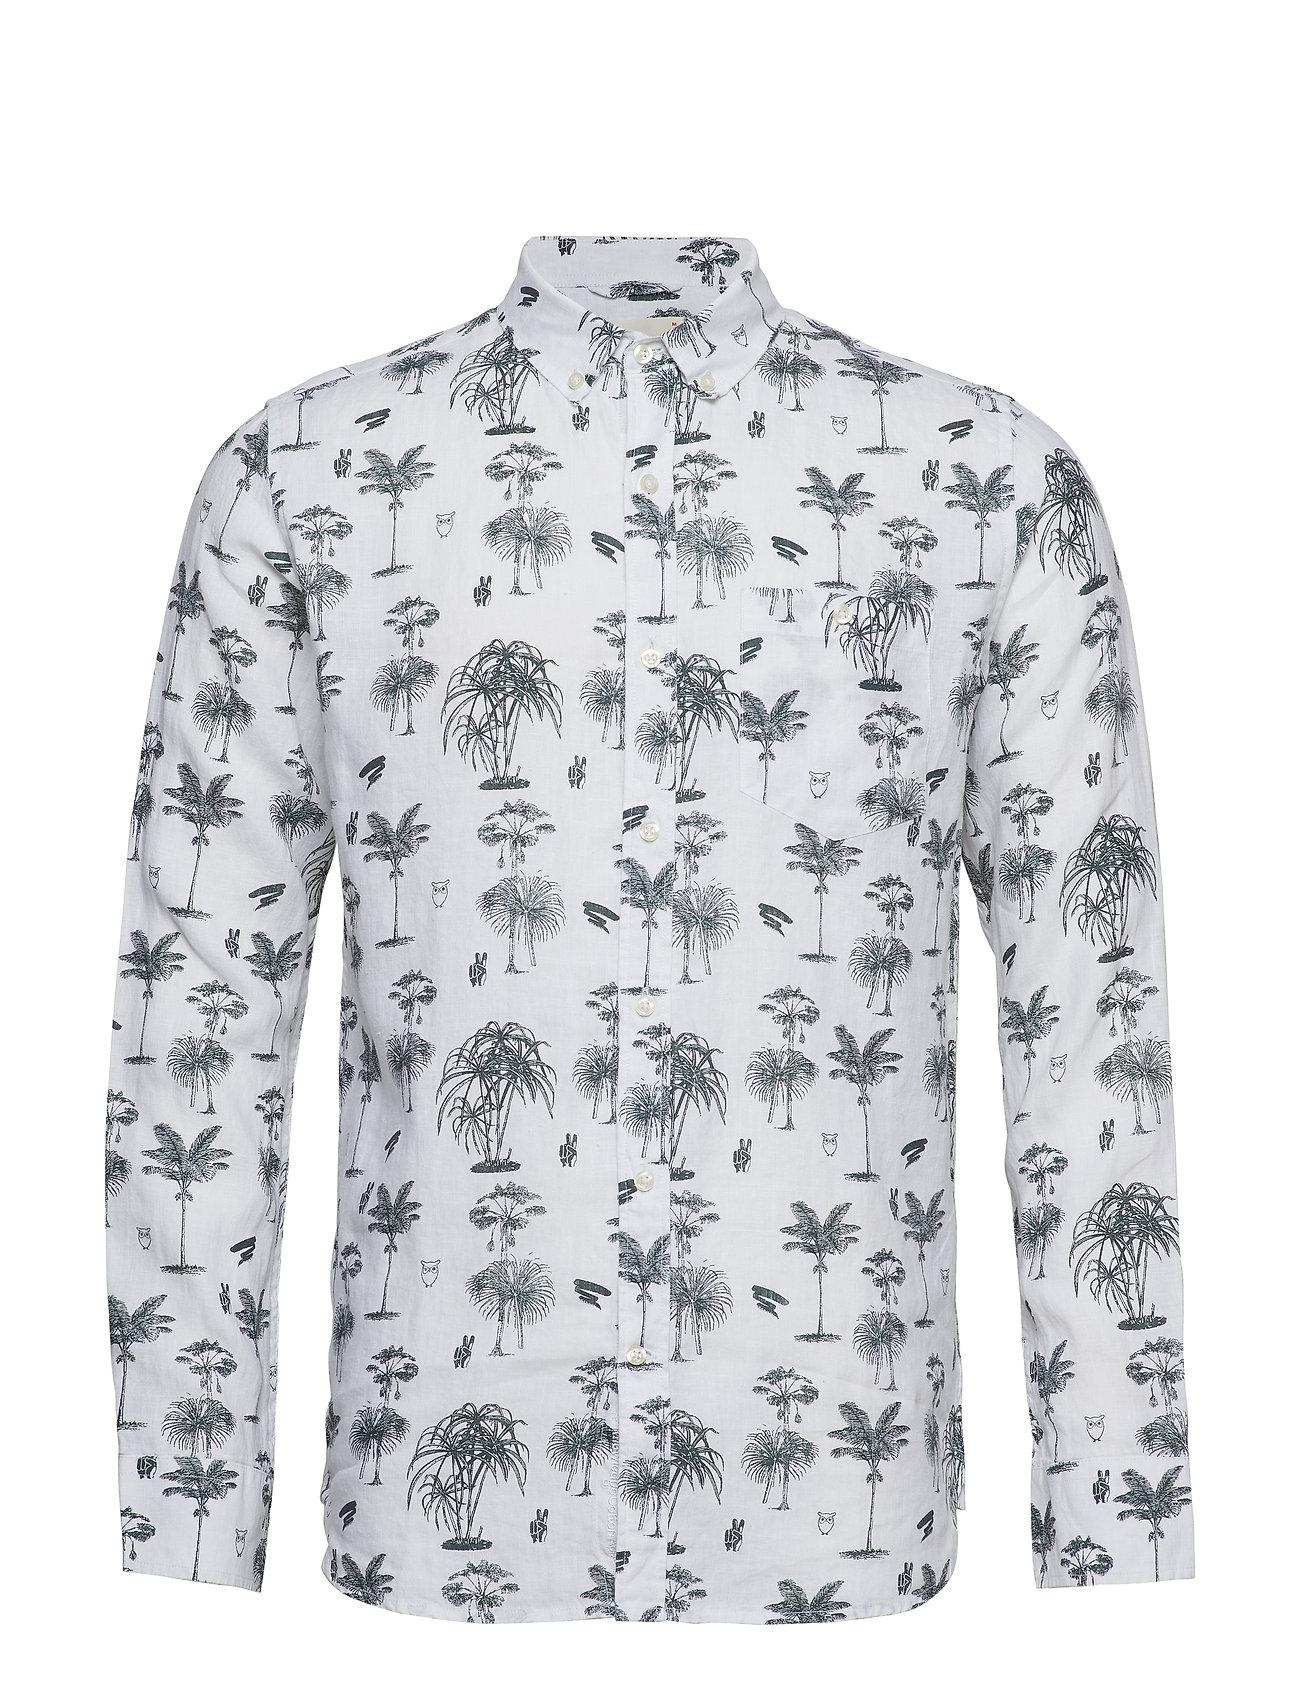 With Apparel Printforrest Palm Shirt Cotton NightKnowledge 3j5RAqc4L